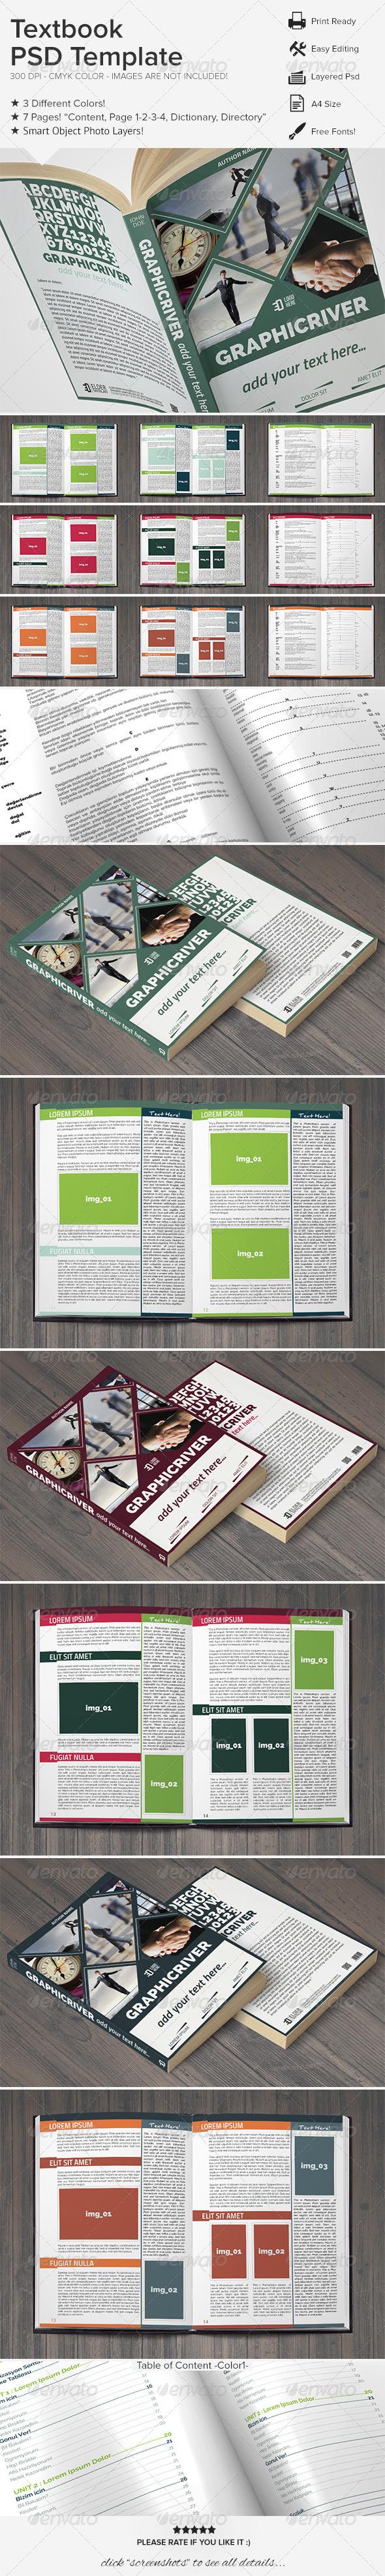 GraphicRiver Textbook PSD Template 6513368